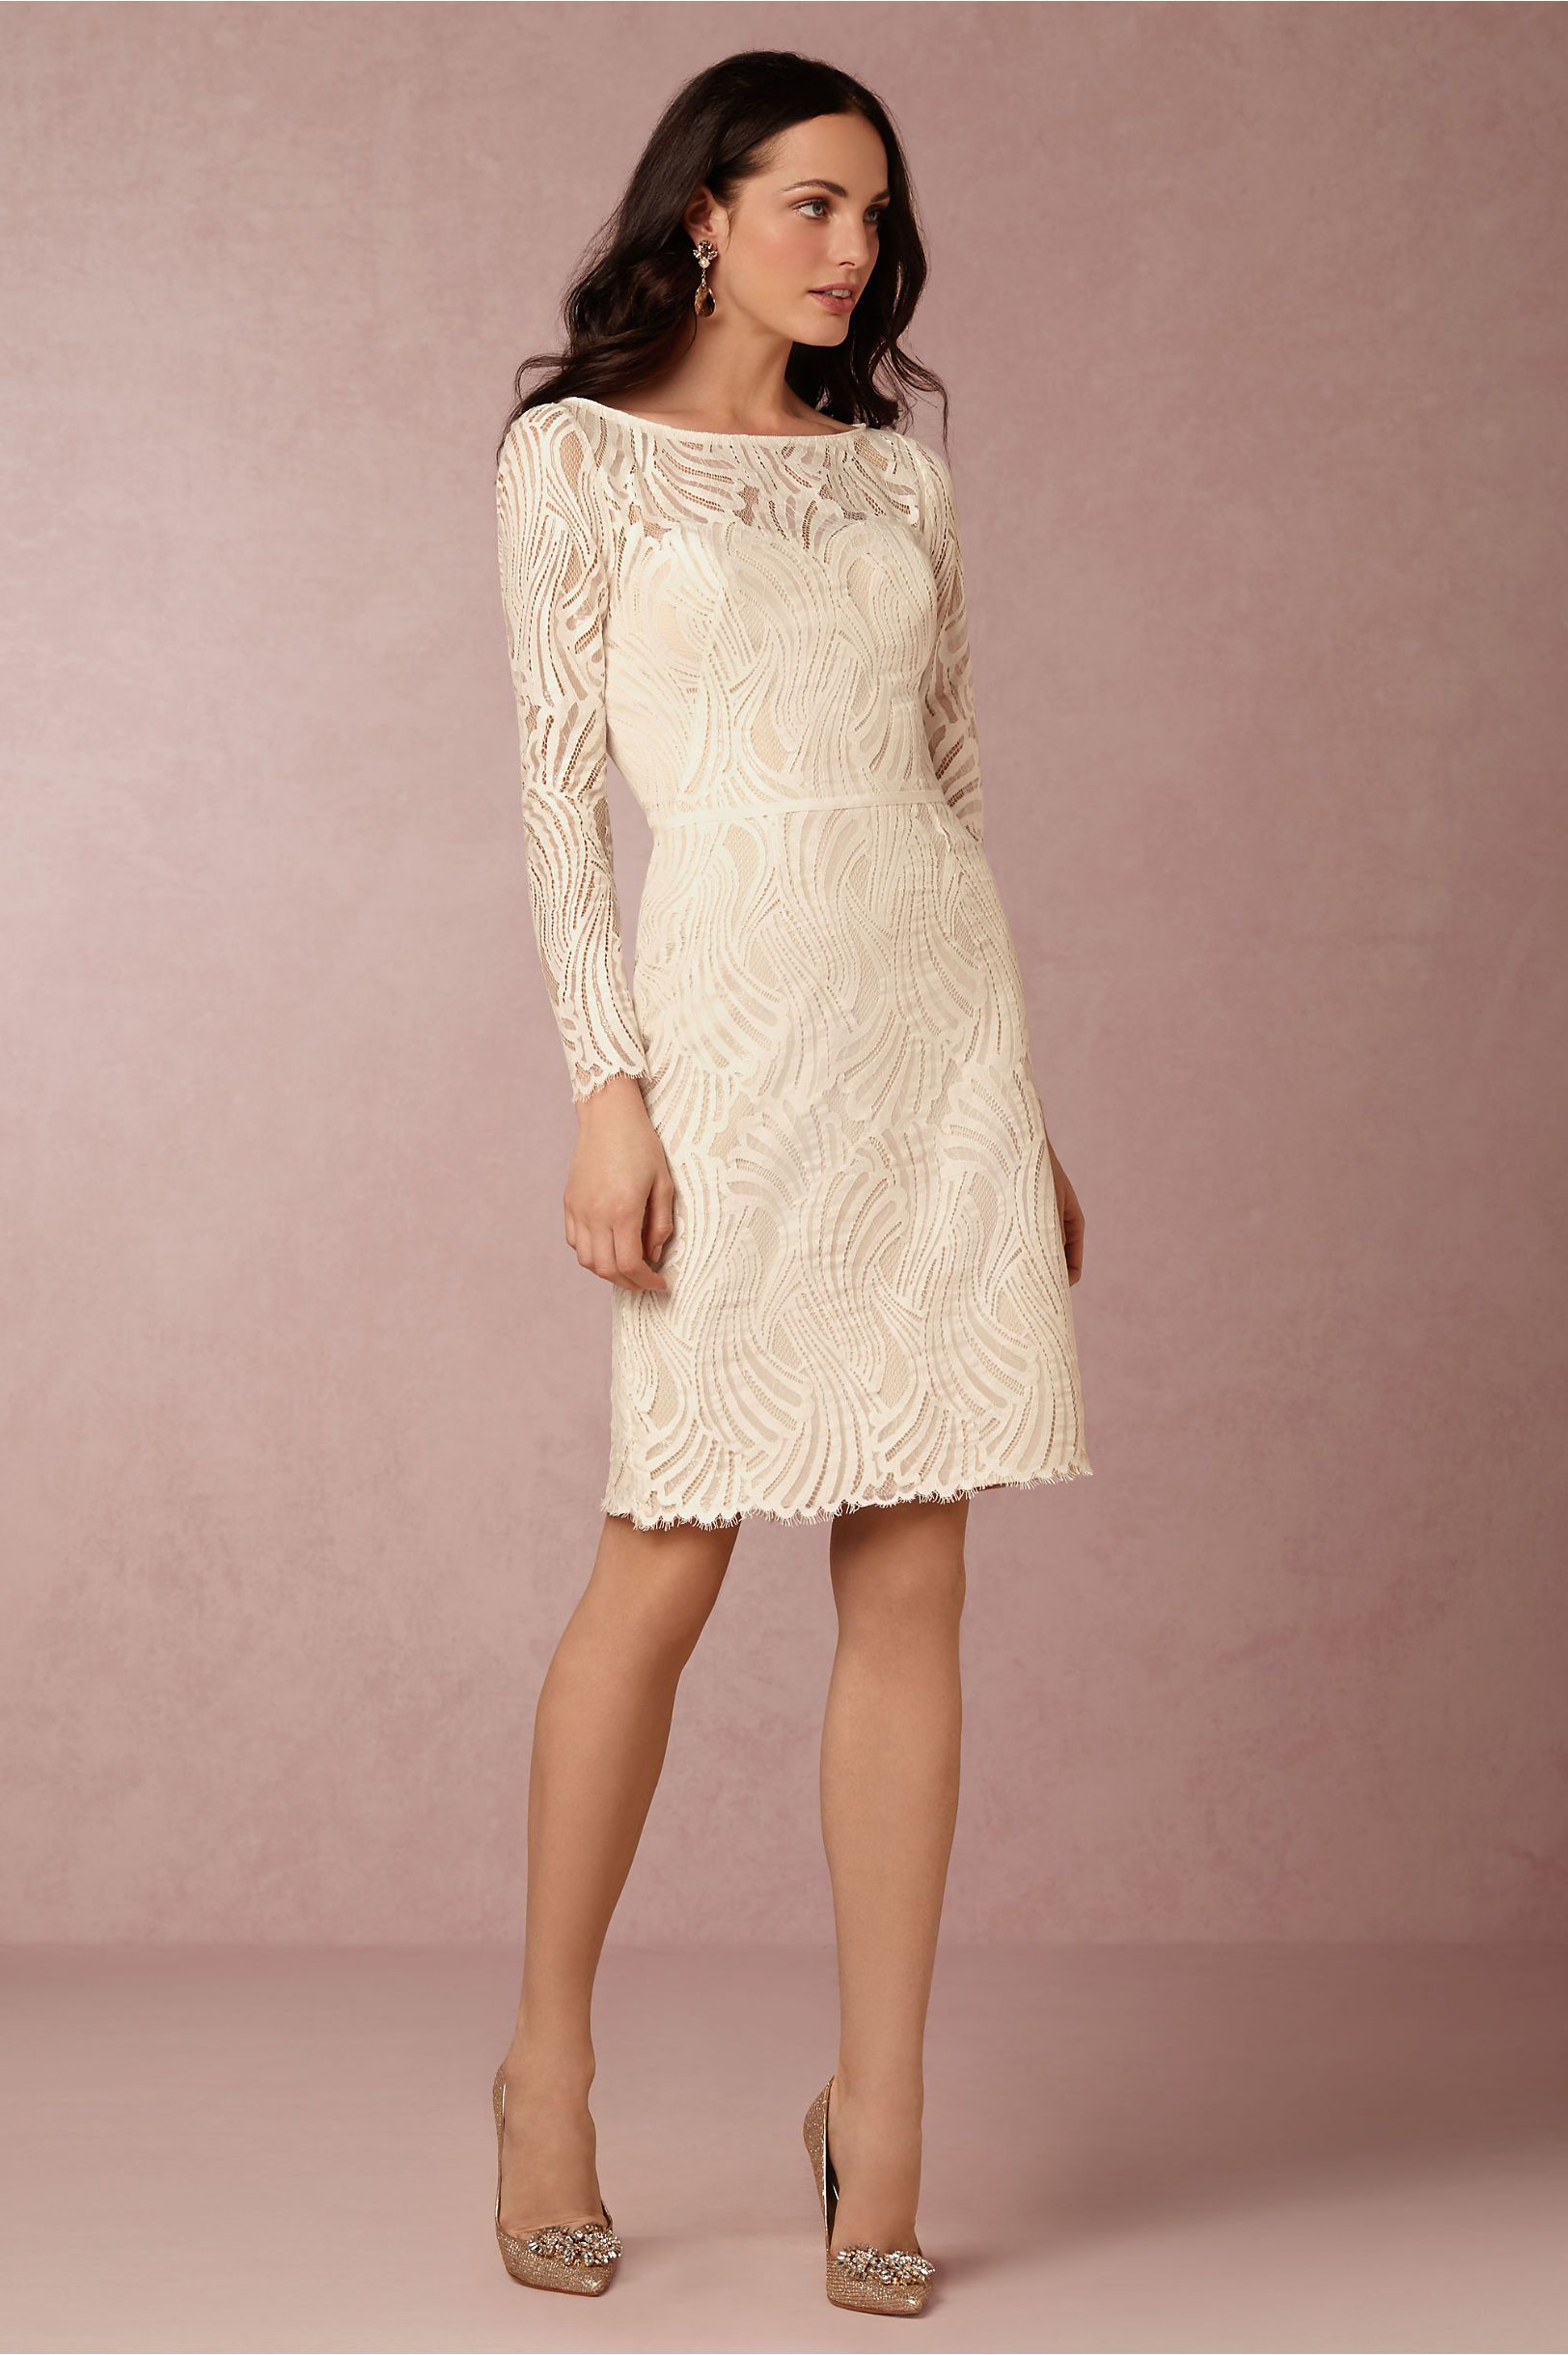 currant dress in bride at bhldn patty s wedding pinterest